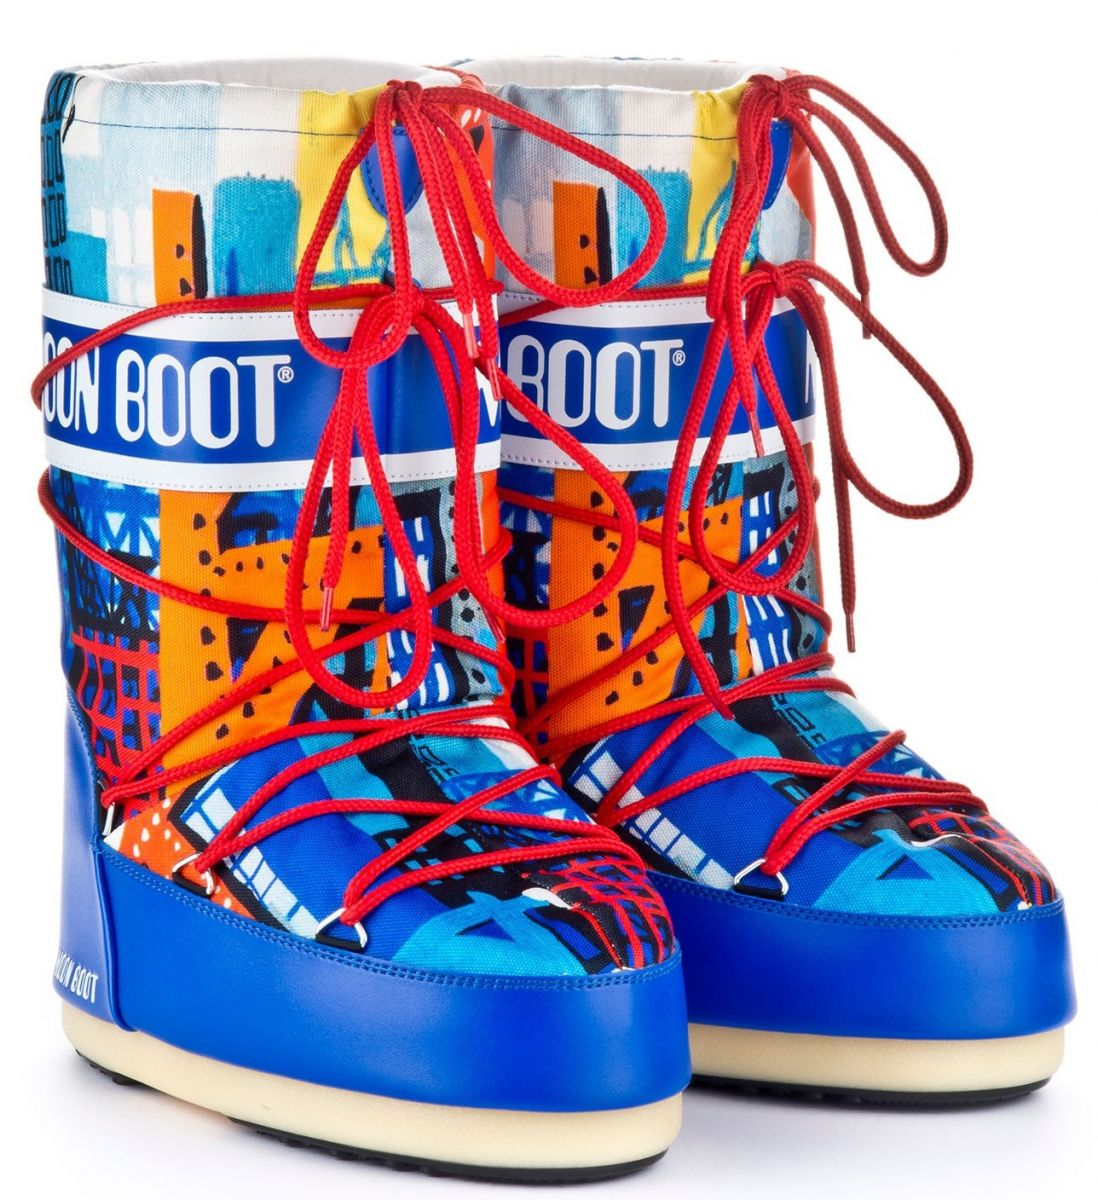 Moon Boot JR Industrial / 27-30, 31-34.